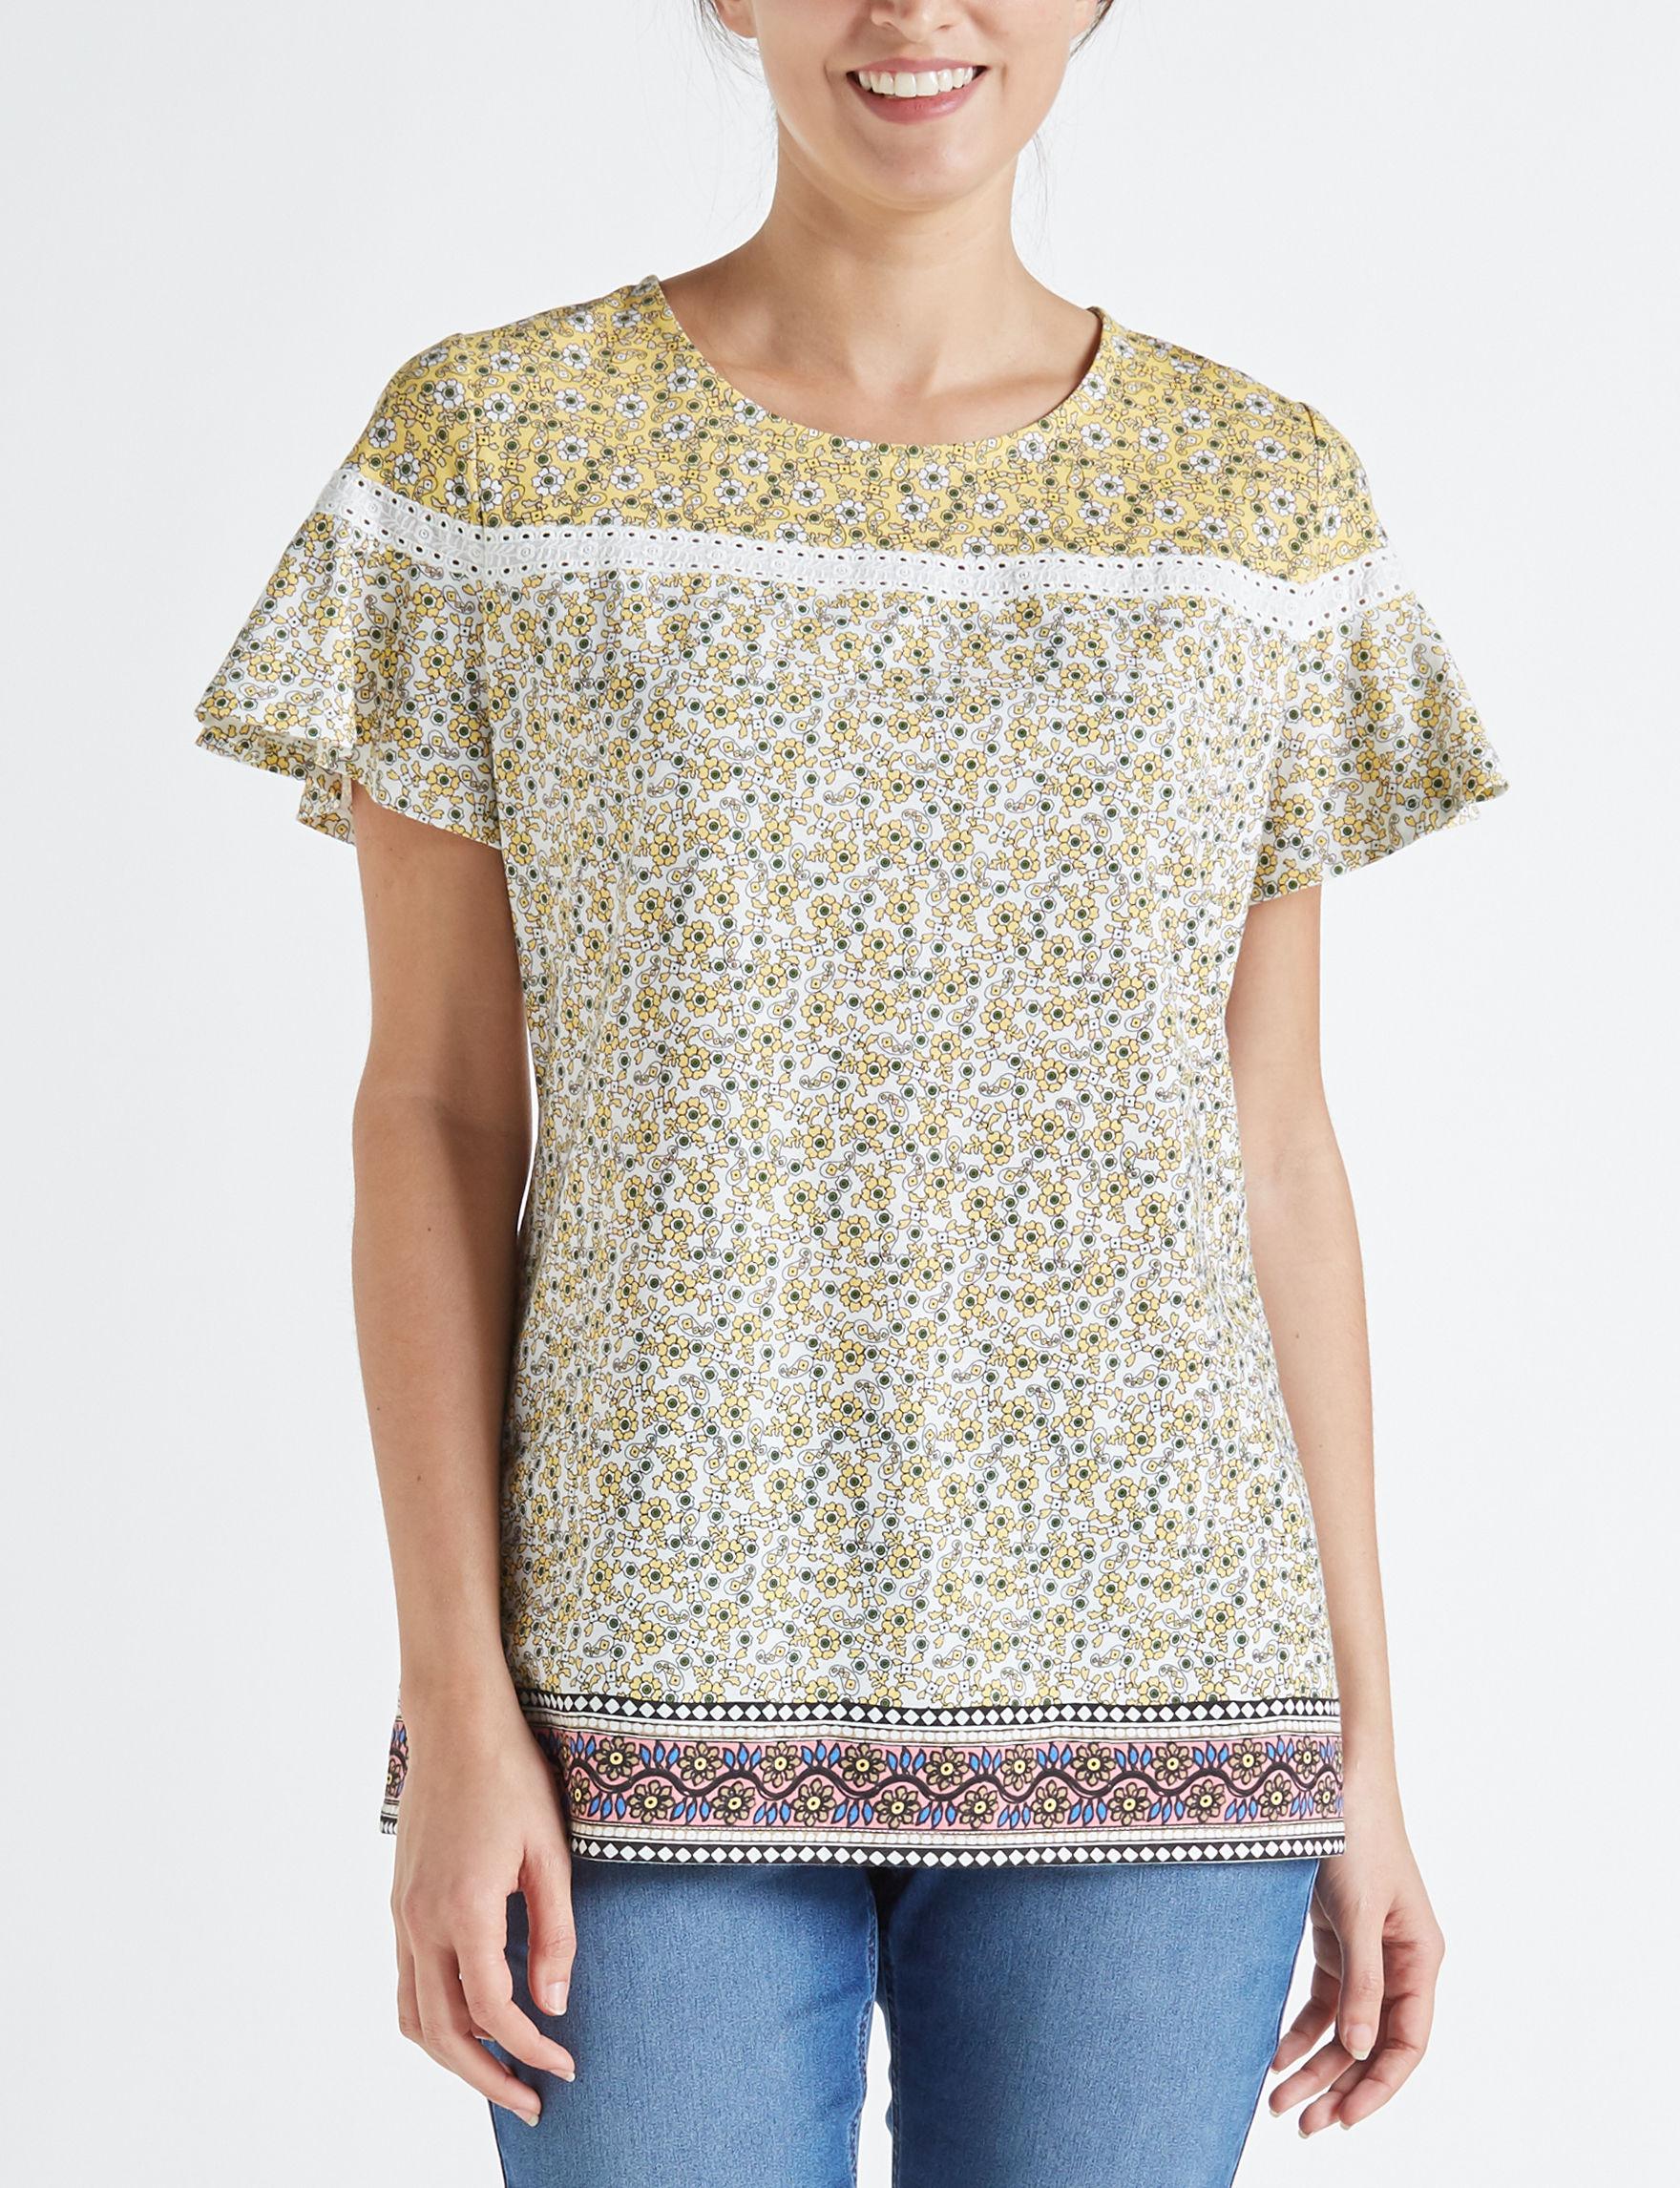 Hannah White / Yellow Shirts & Blouses